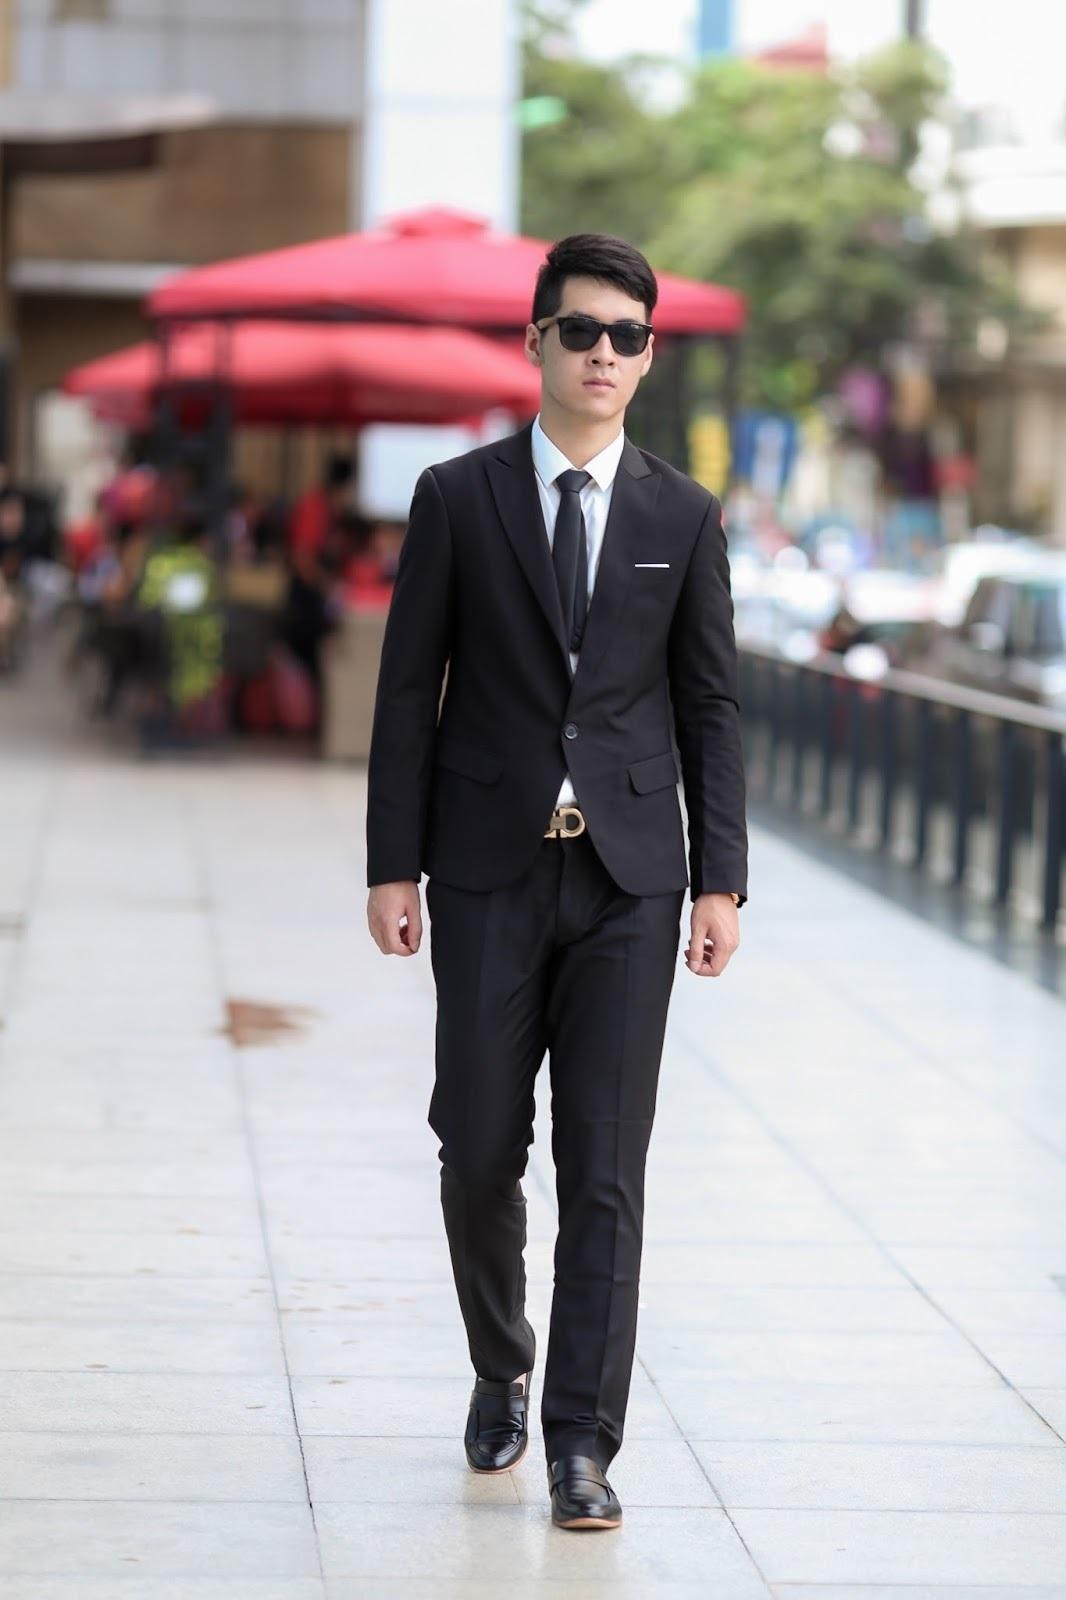 Mens Black Suit White Dress Shirt Black Leather Loafers Black